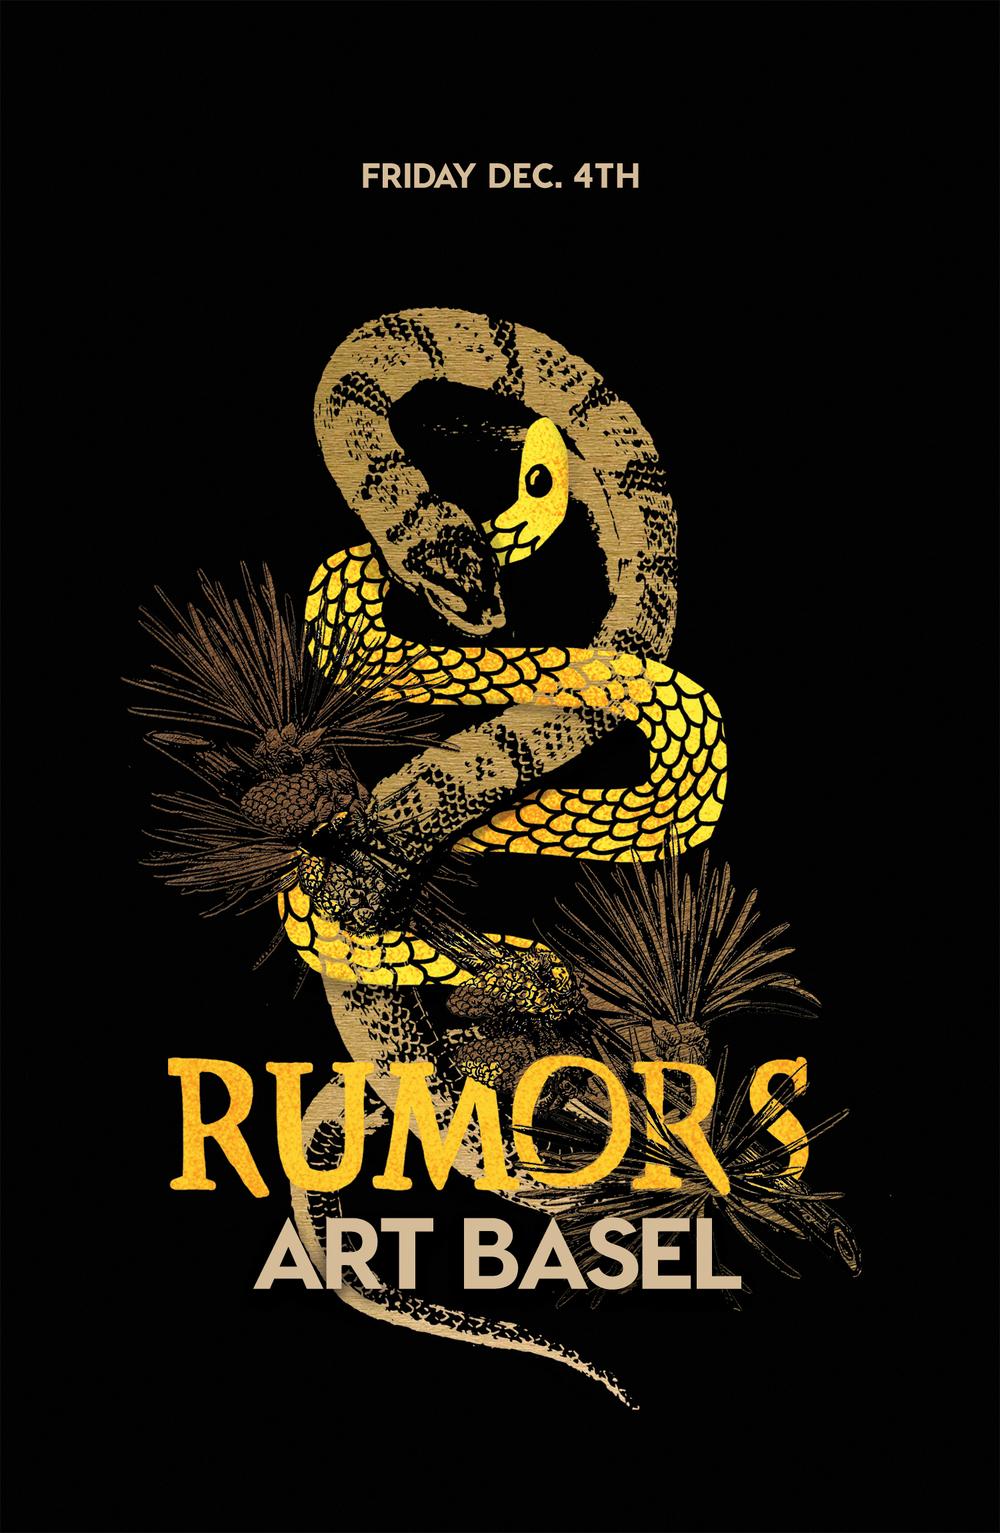 Rumors-BASEL-11x17.jpg